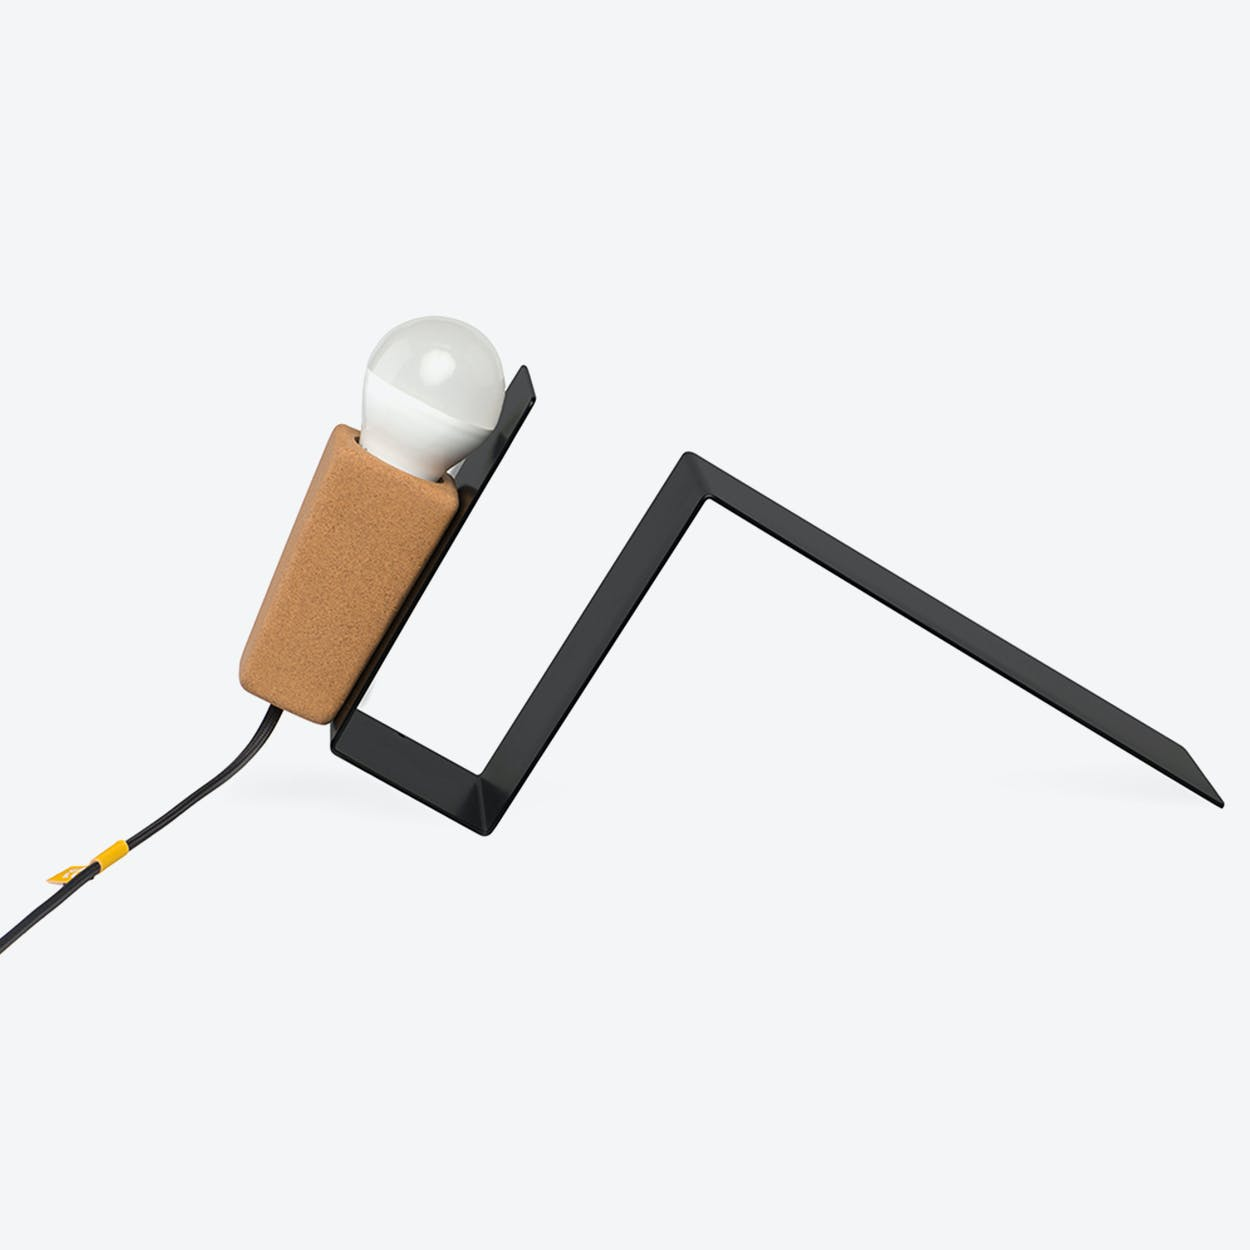 Glint Desk Lamp #1 in Black Base & Black Wire